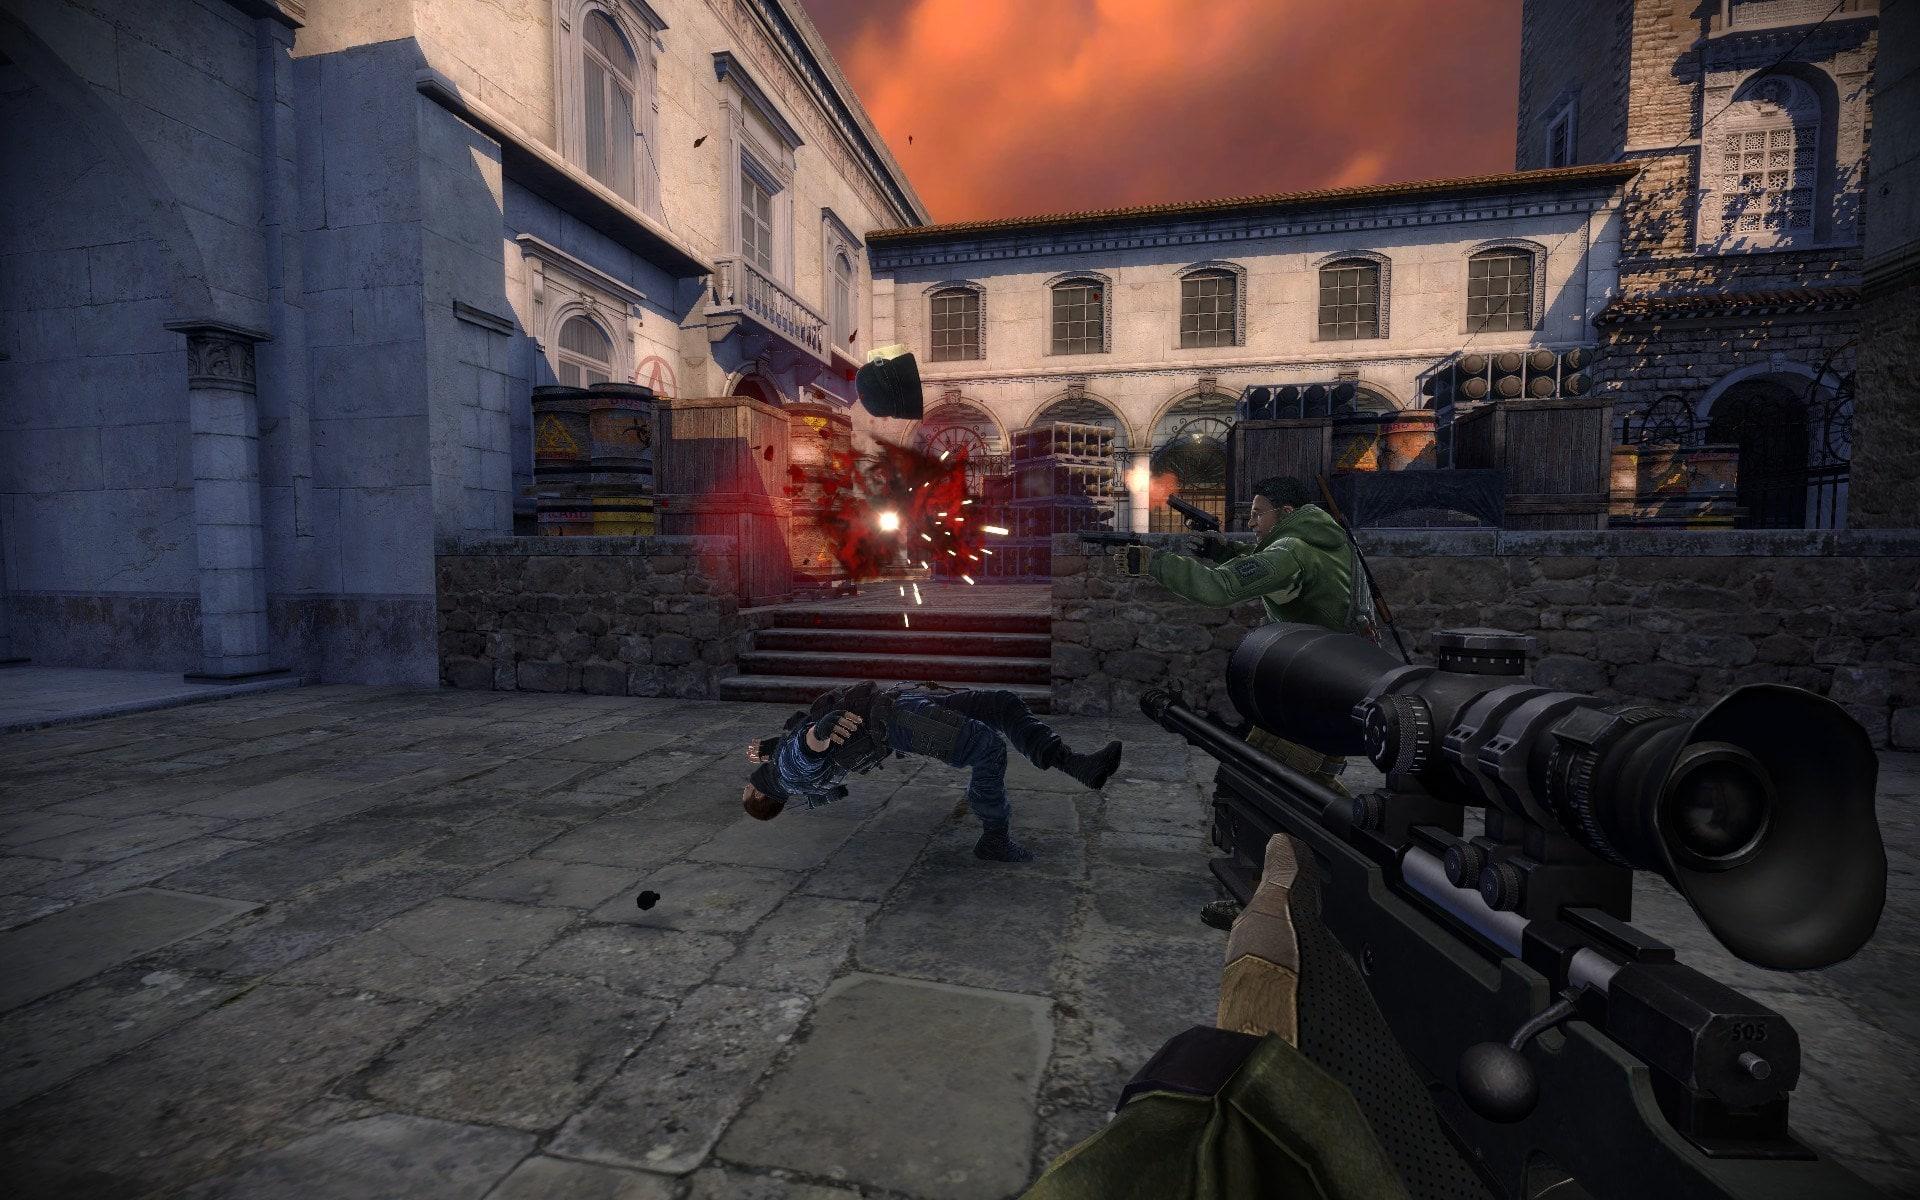 Counter-Strike Online 2 Wallpaper